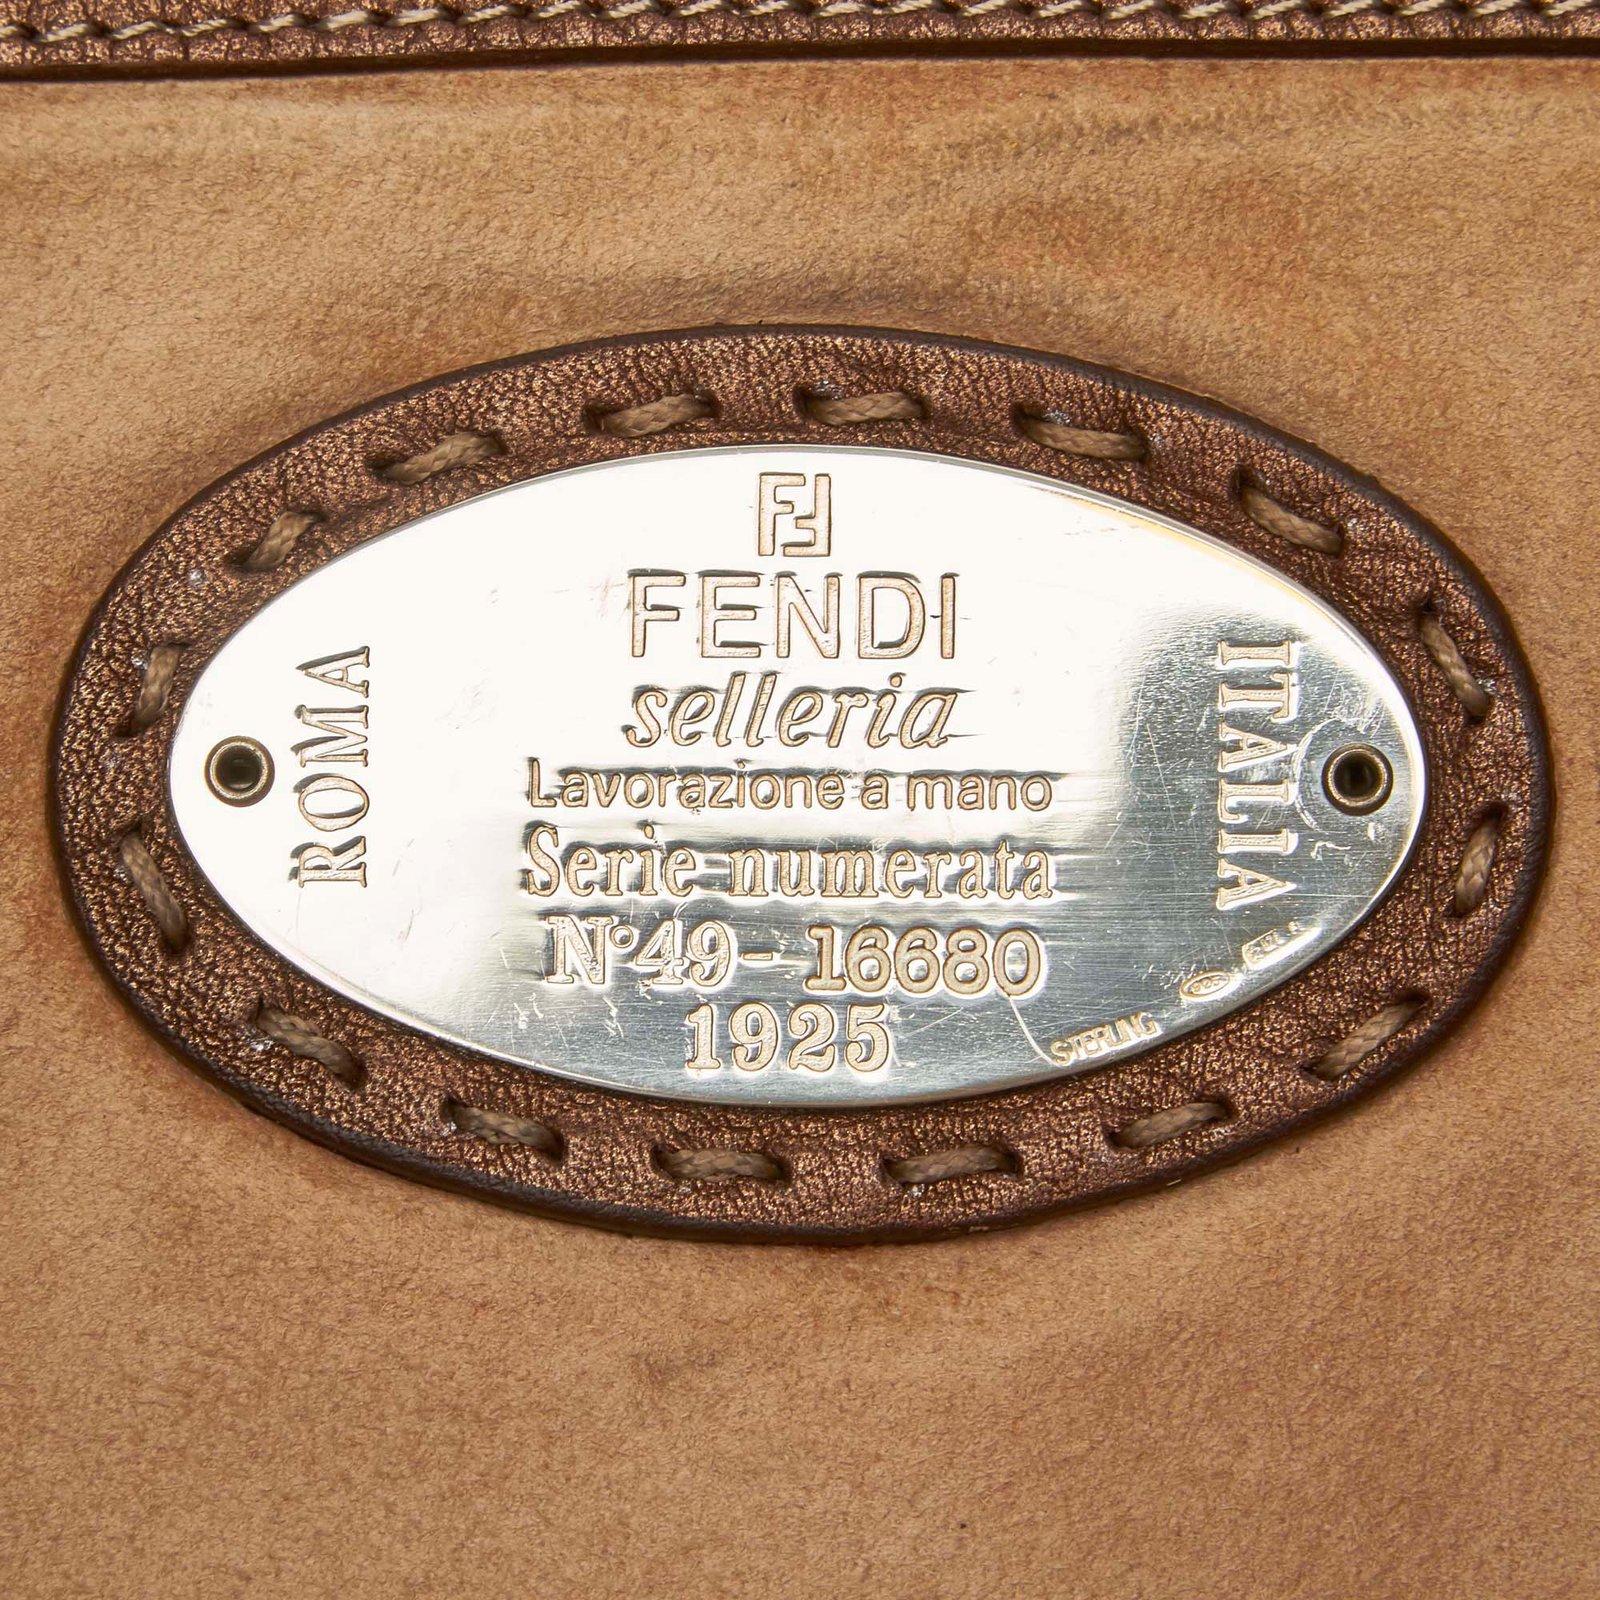 8b98d1f67a11 ... Women s bags Fendi · Totes Fendi · Facebook · Pin This. Fendi Selleria  Leather ...